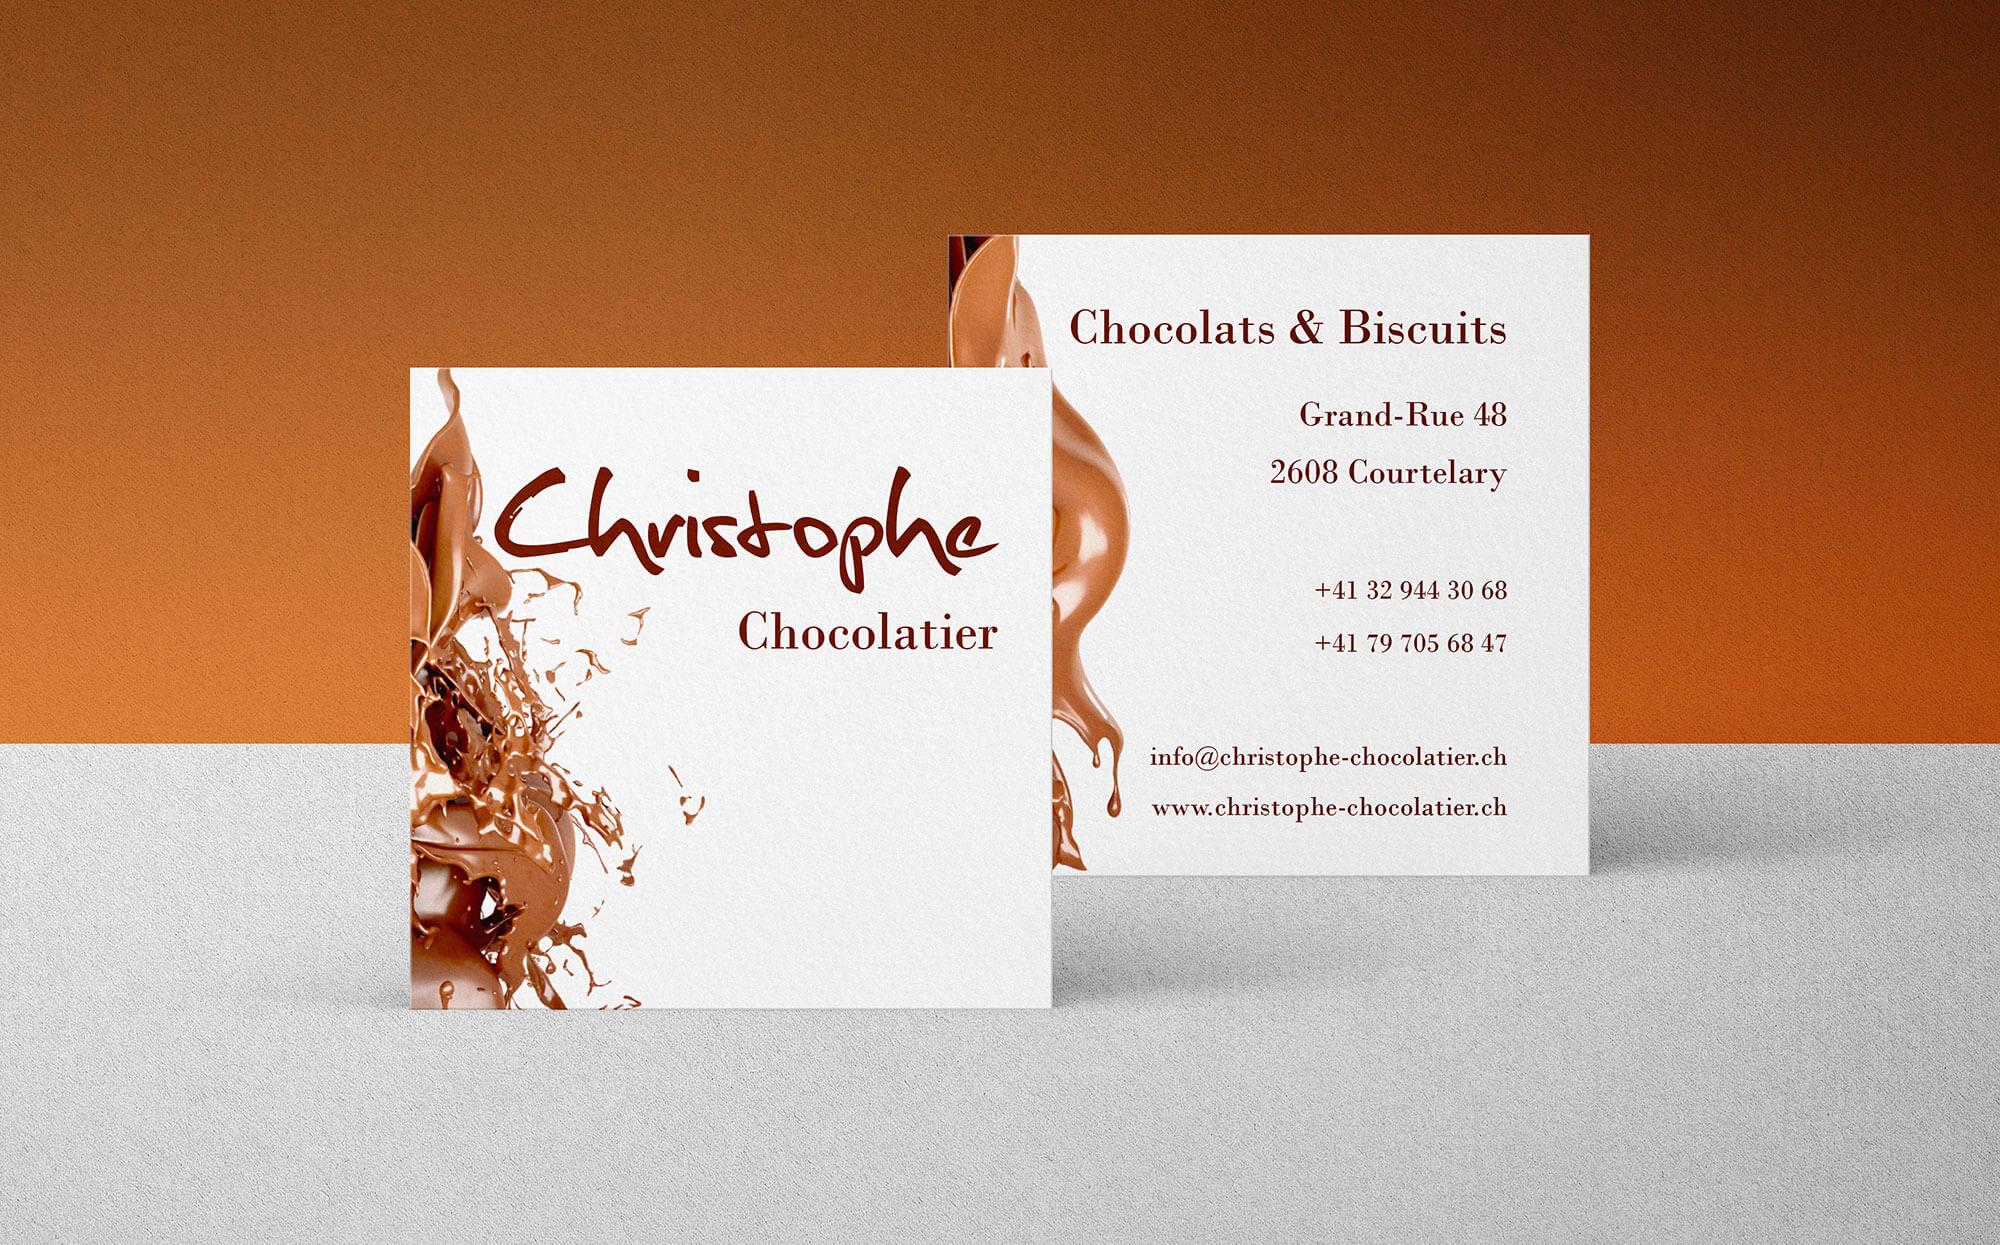 cartes de visite Christophe Chocolatier